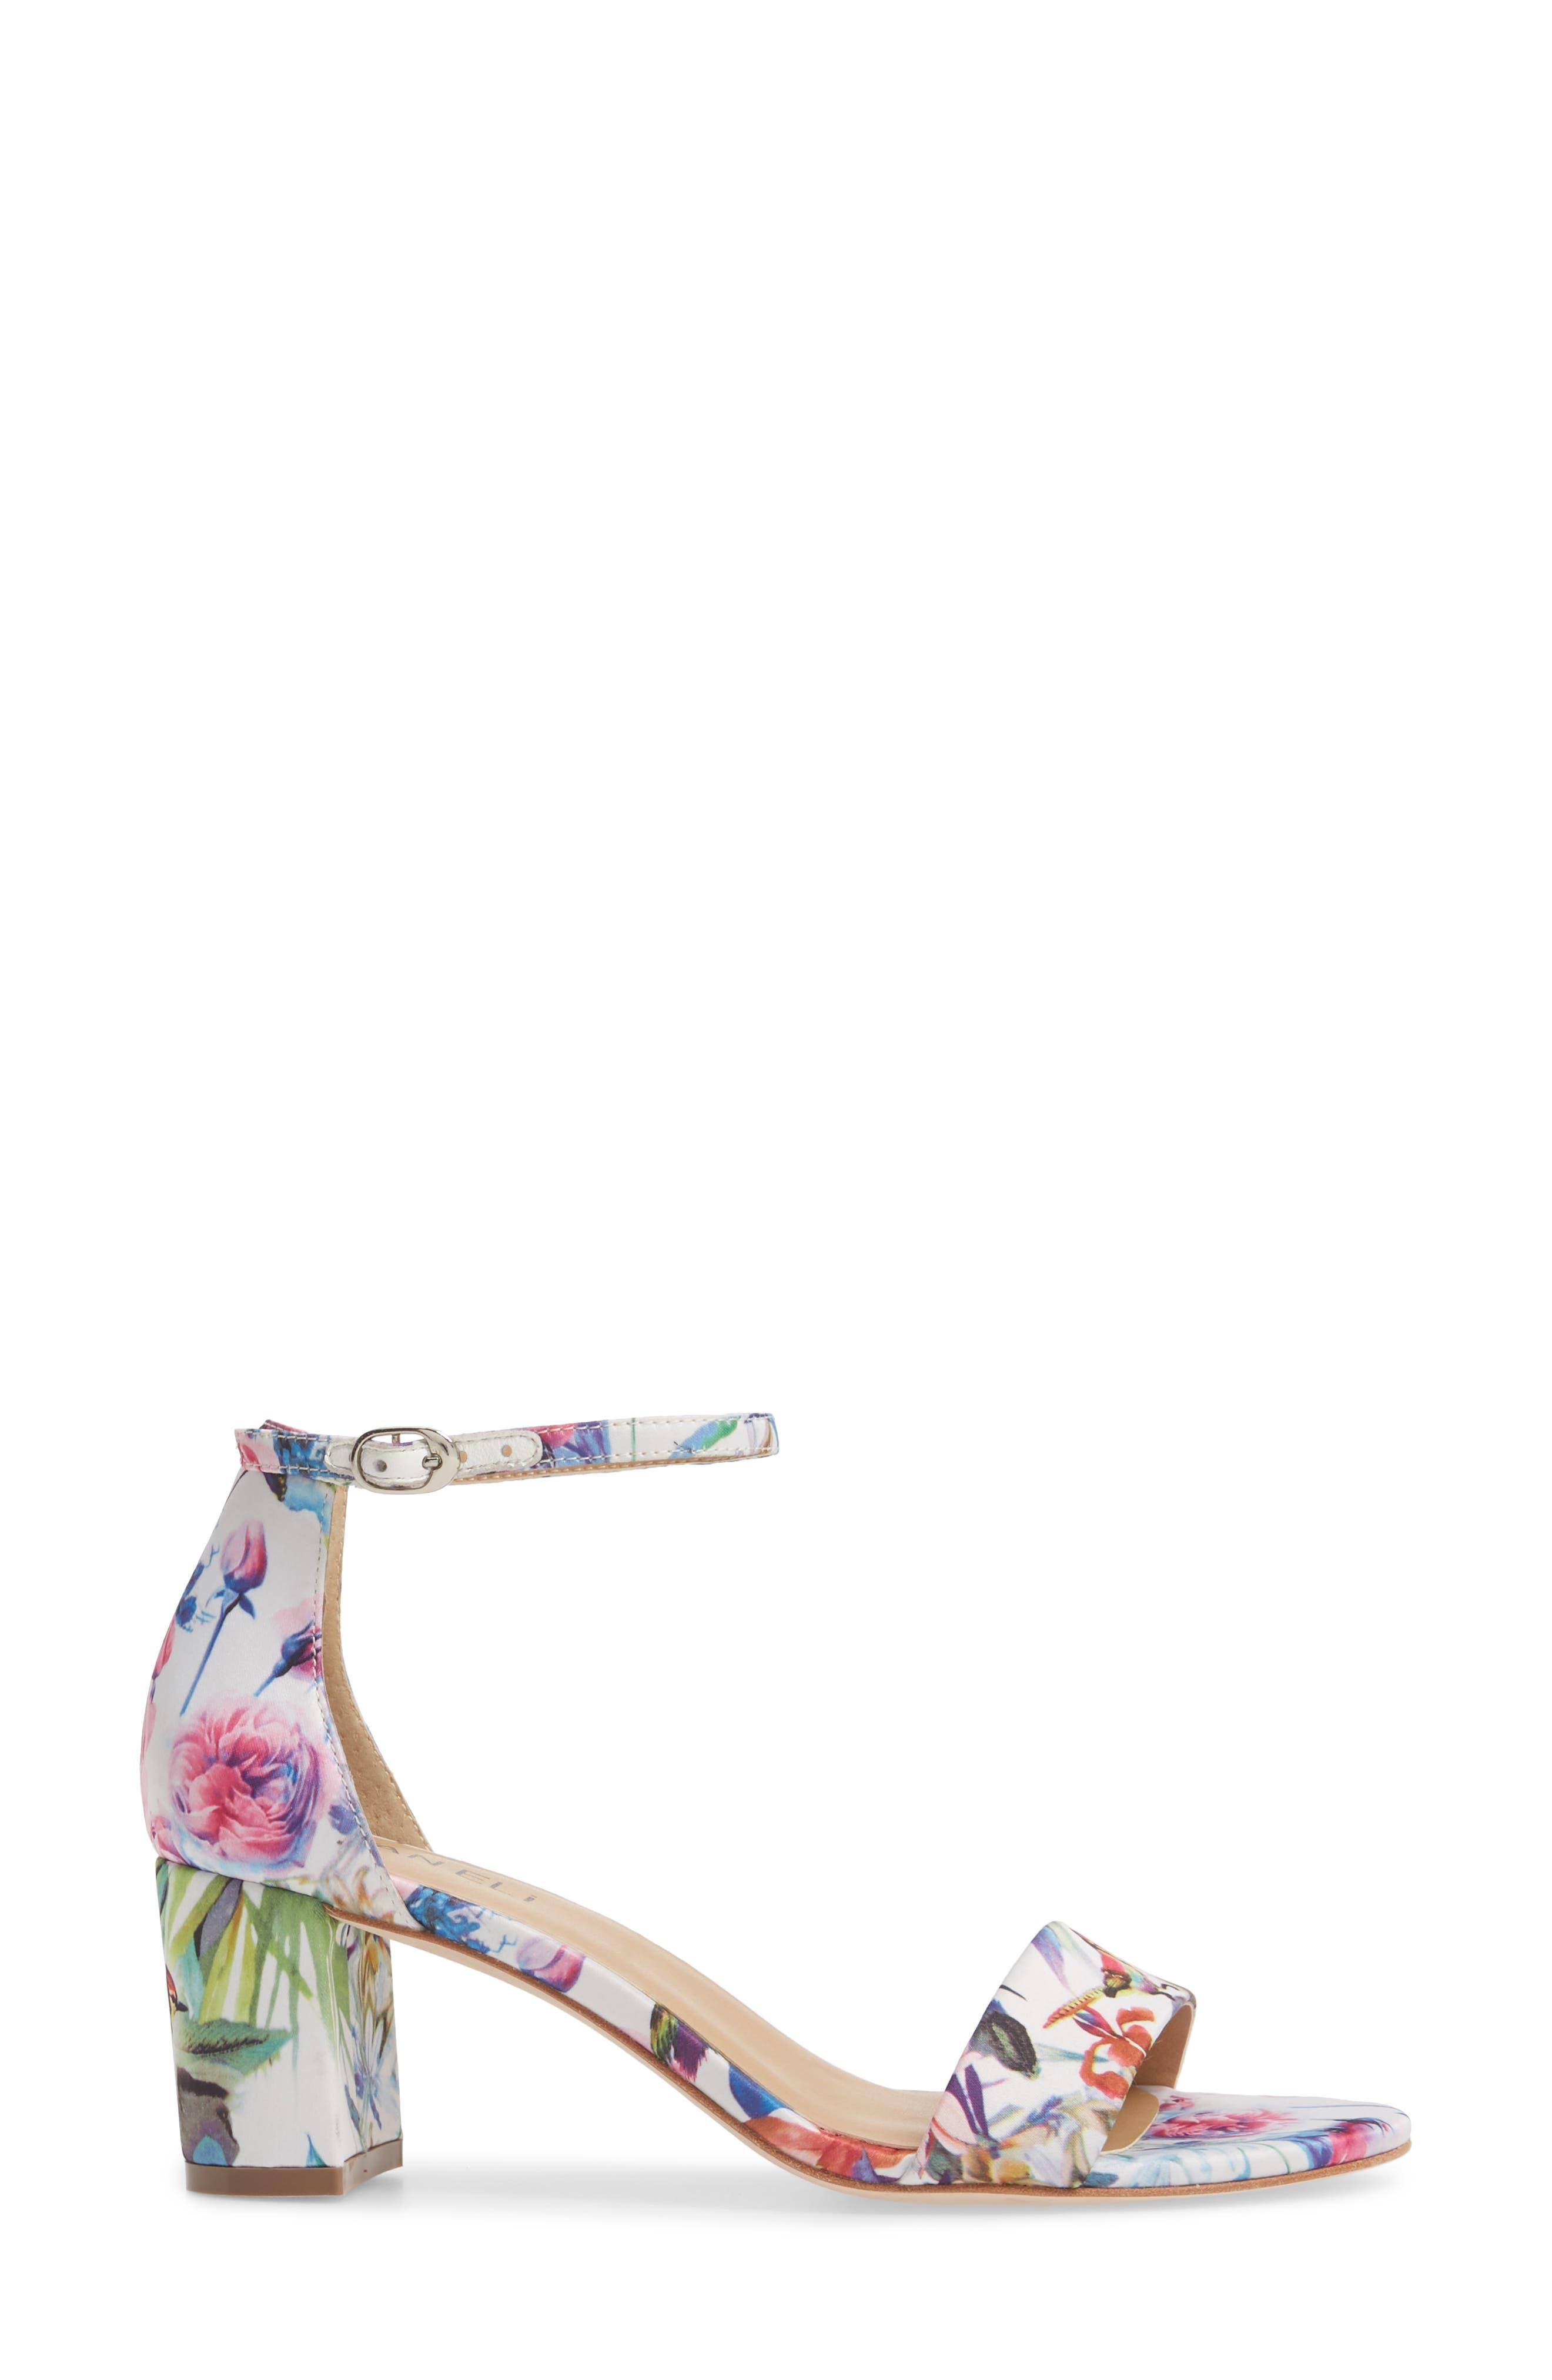 Meres Ankle Strap Sandal,                             Alternate thumbnail 3, color,                             400